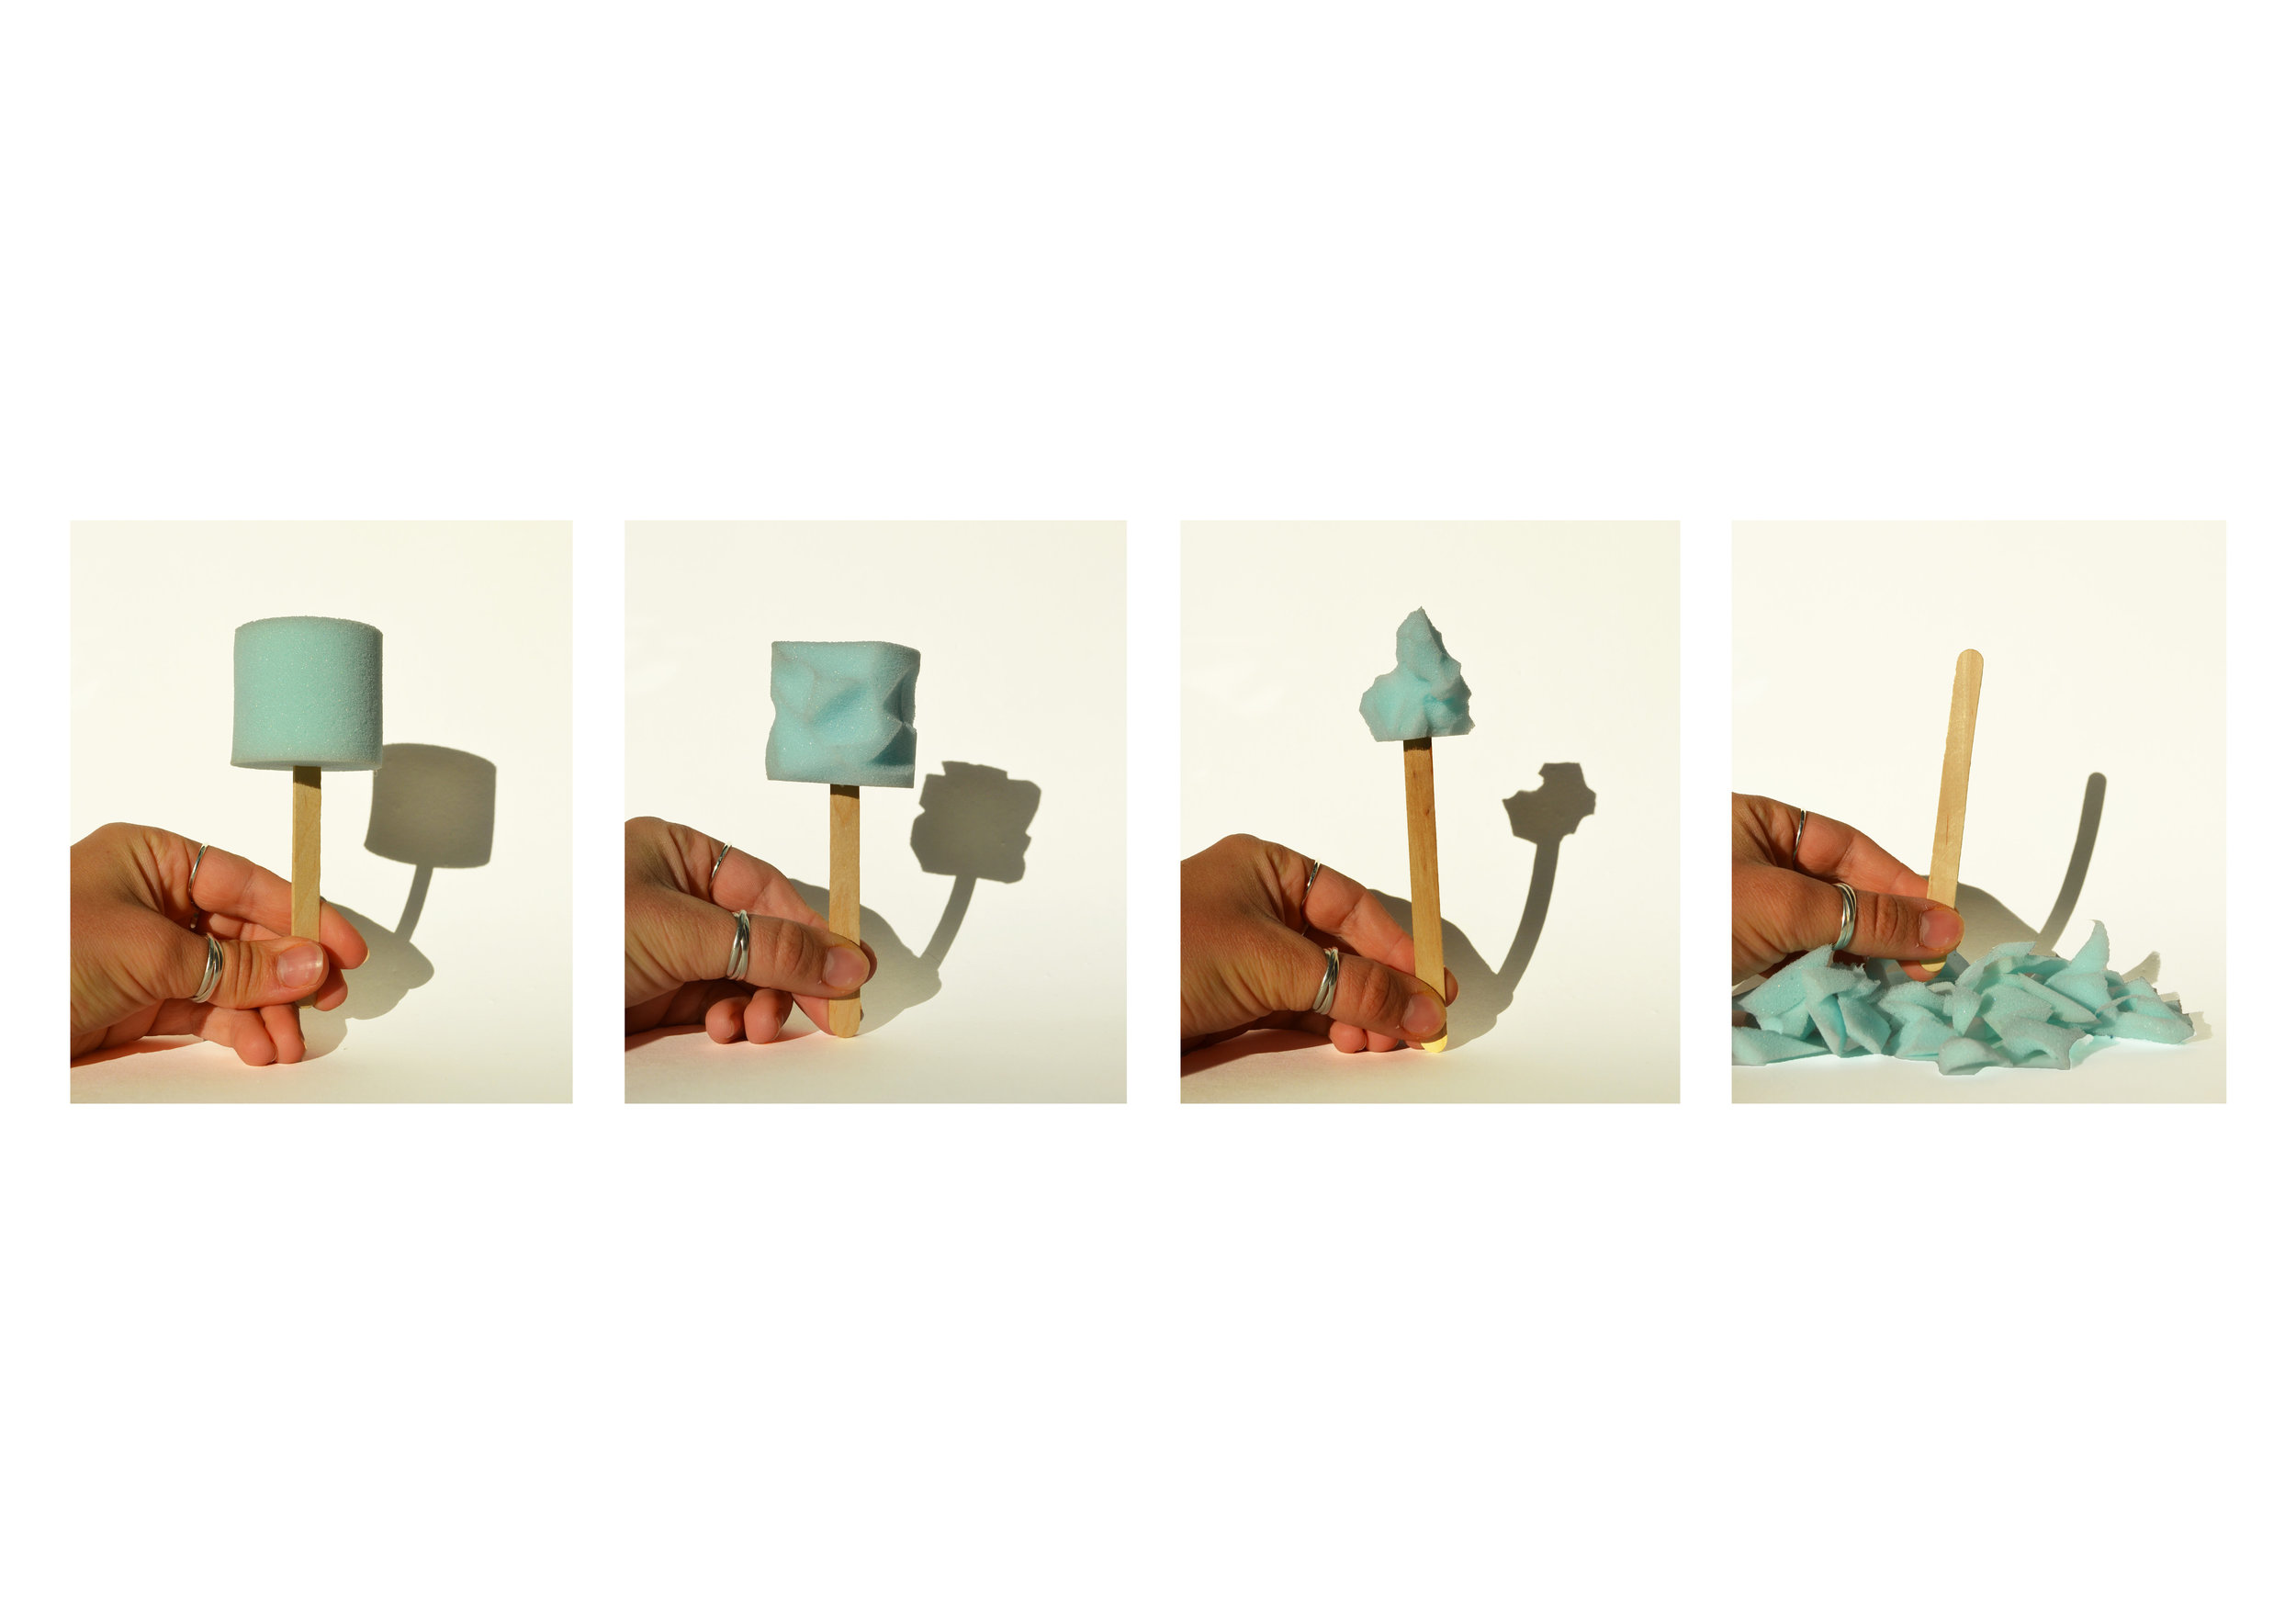 Melting Ice Berg-Britt W.jpg